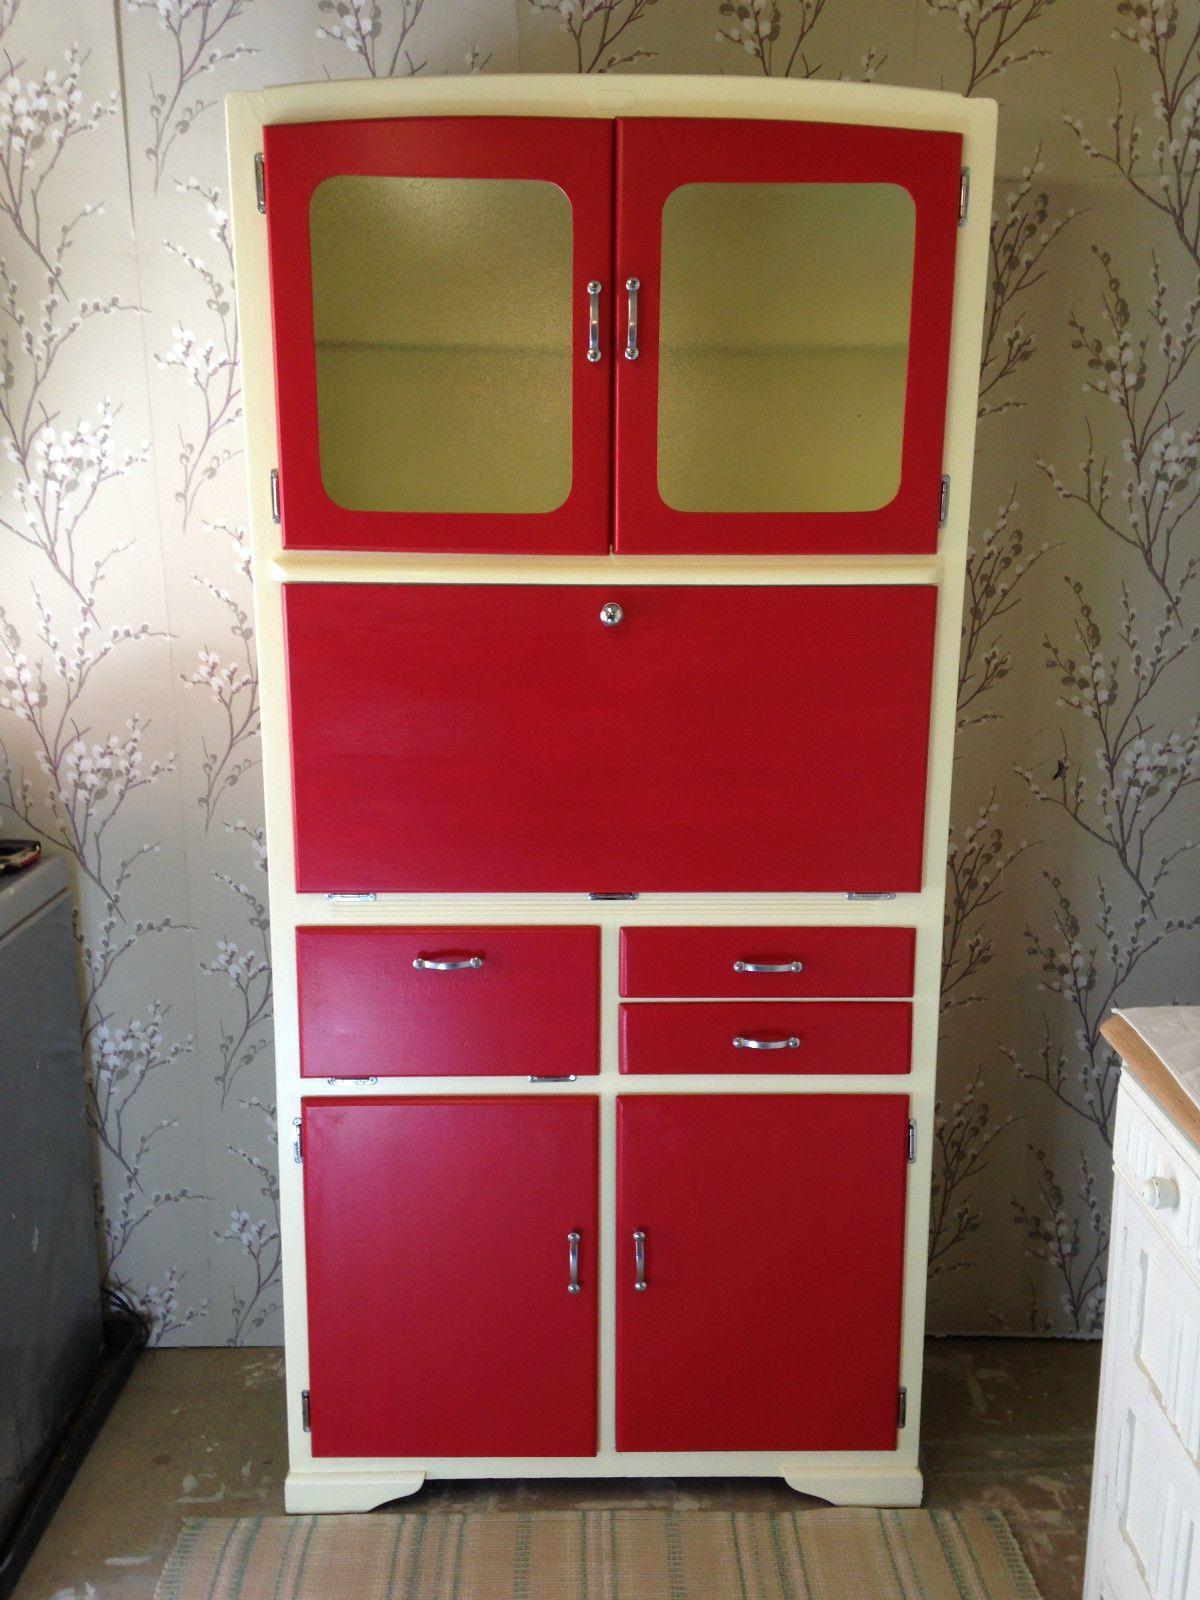 Ebay Used Kitchen Cabinets